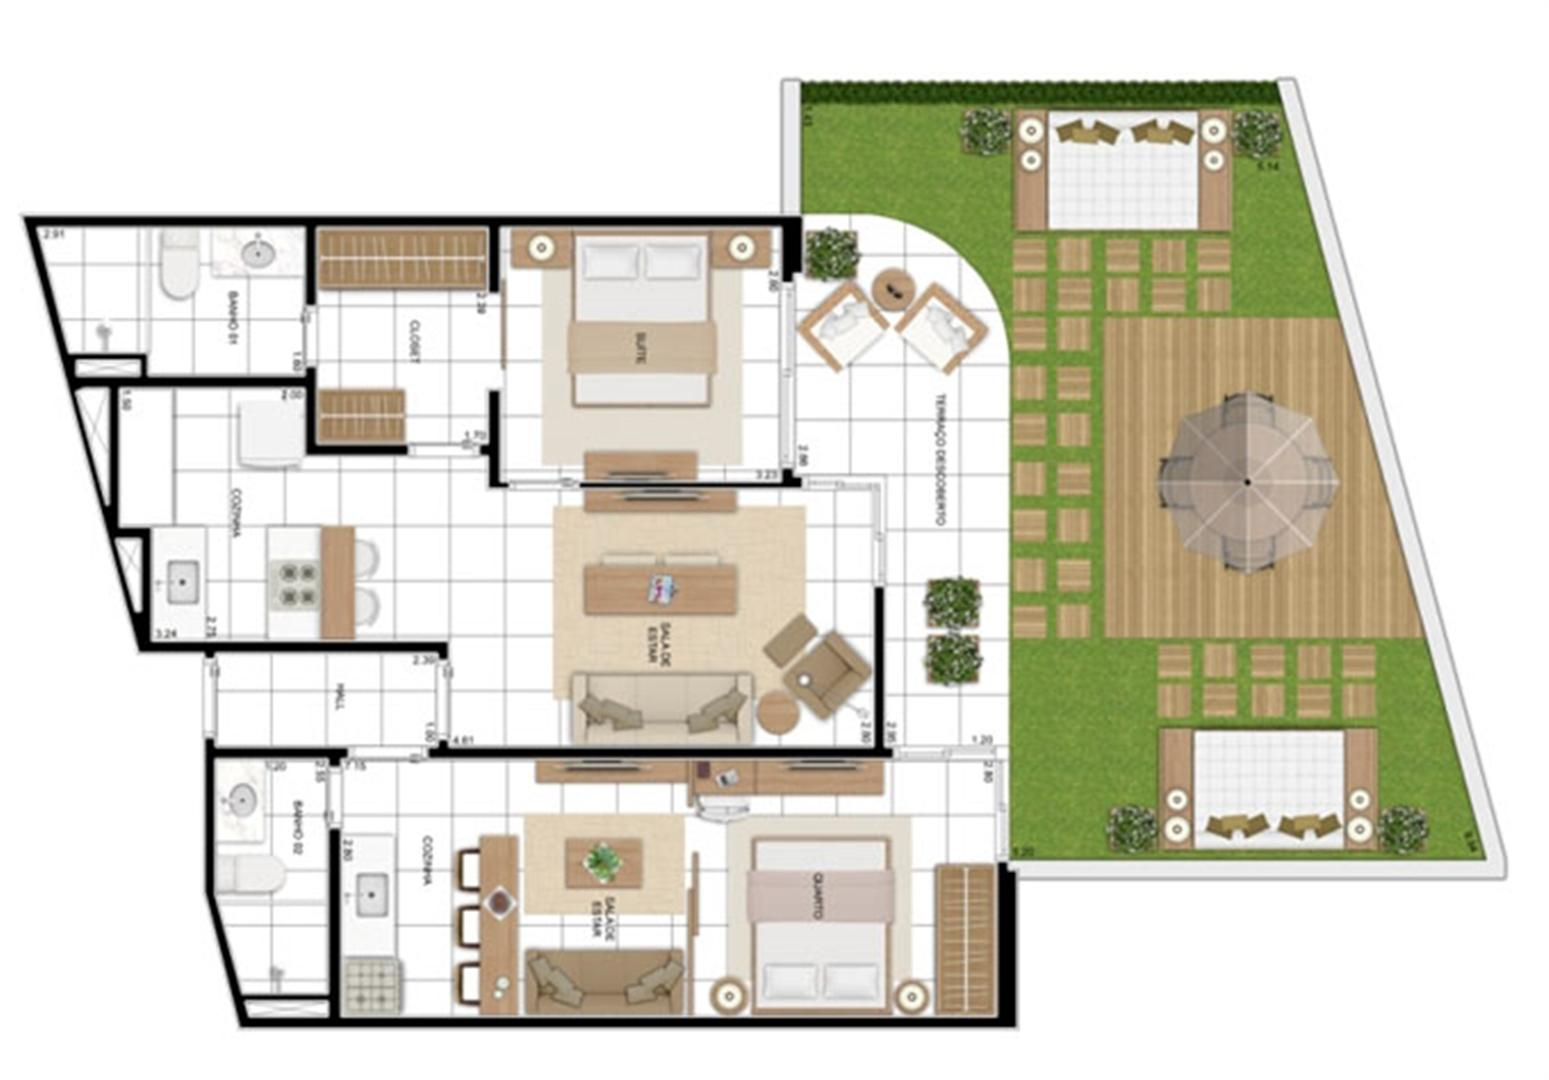 PLANTA - APTO TIPO A - MAISON 117 m²  | In Mare Bali – Apartamento no  Distrito Litoral de Cotovelo - Parnamirim - Rio Grande do Norte